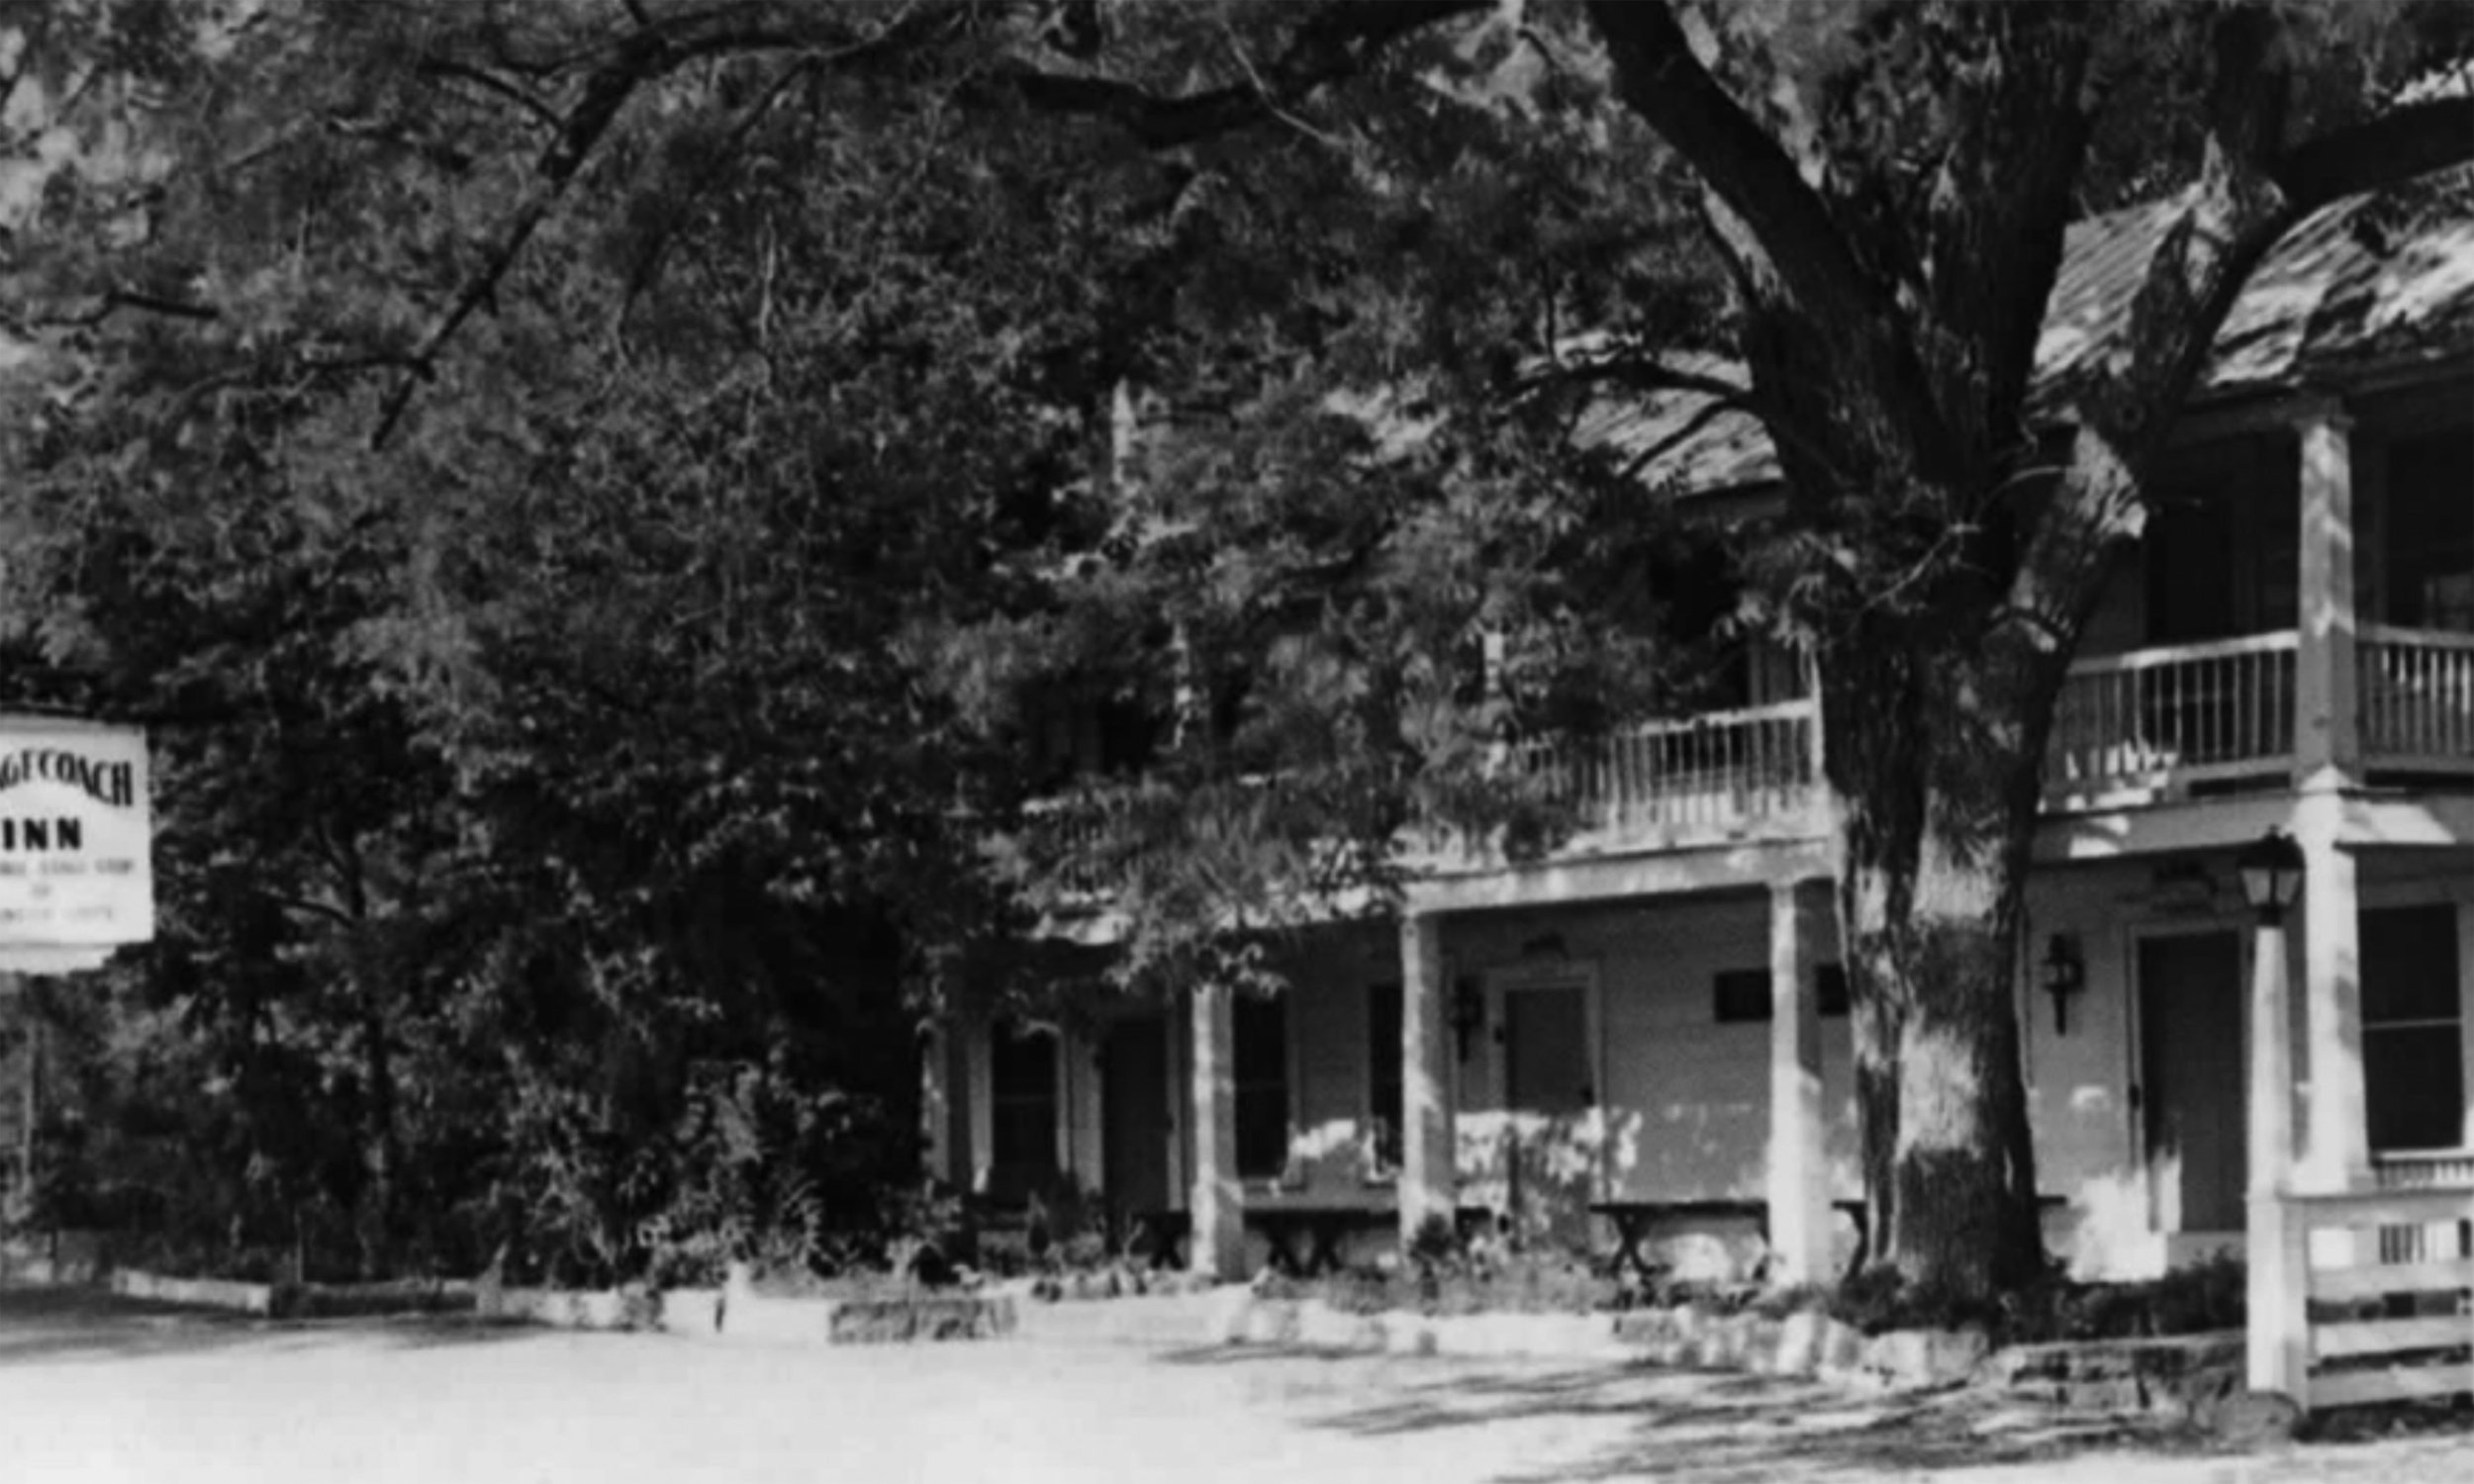 stagecoach_inn_history_hotel.jpg